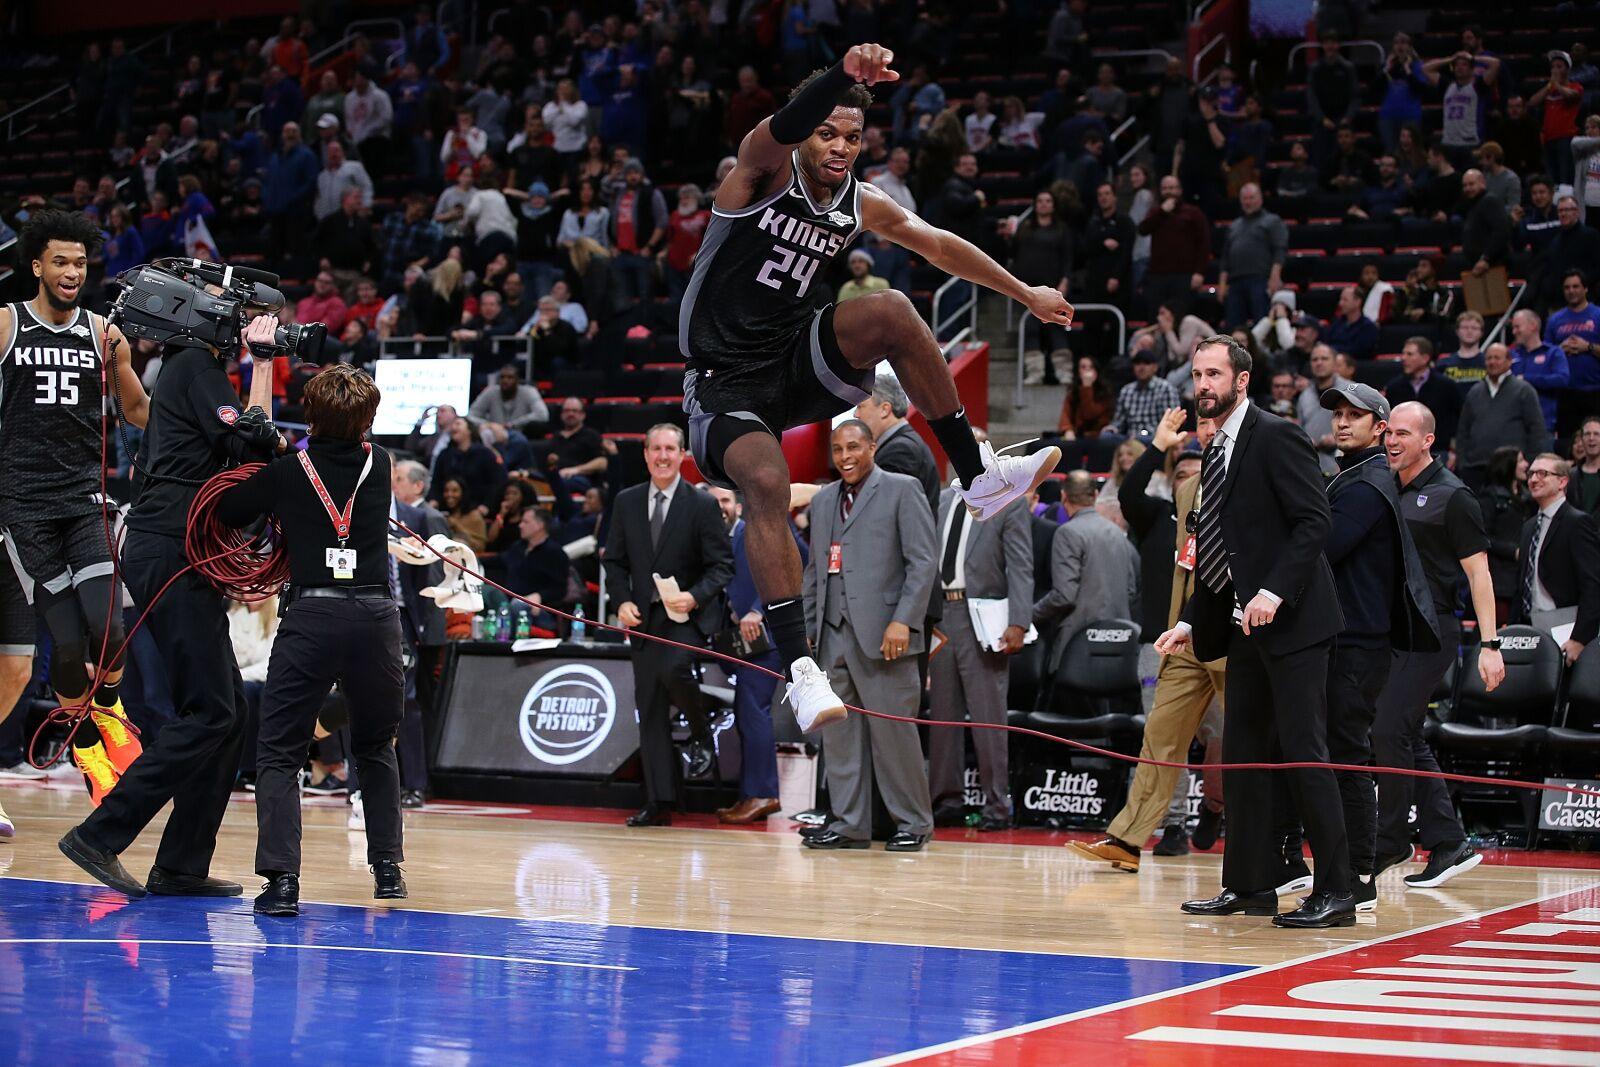 Kings vs. Pistons: Odds, Injuries, & Predictions